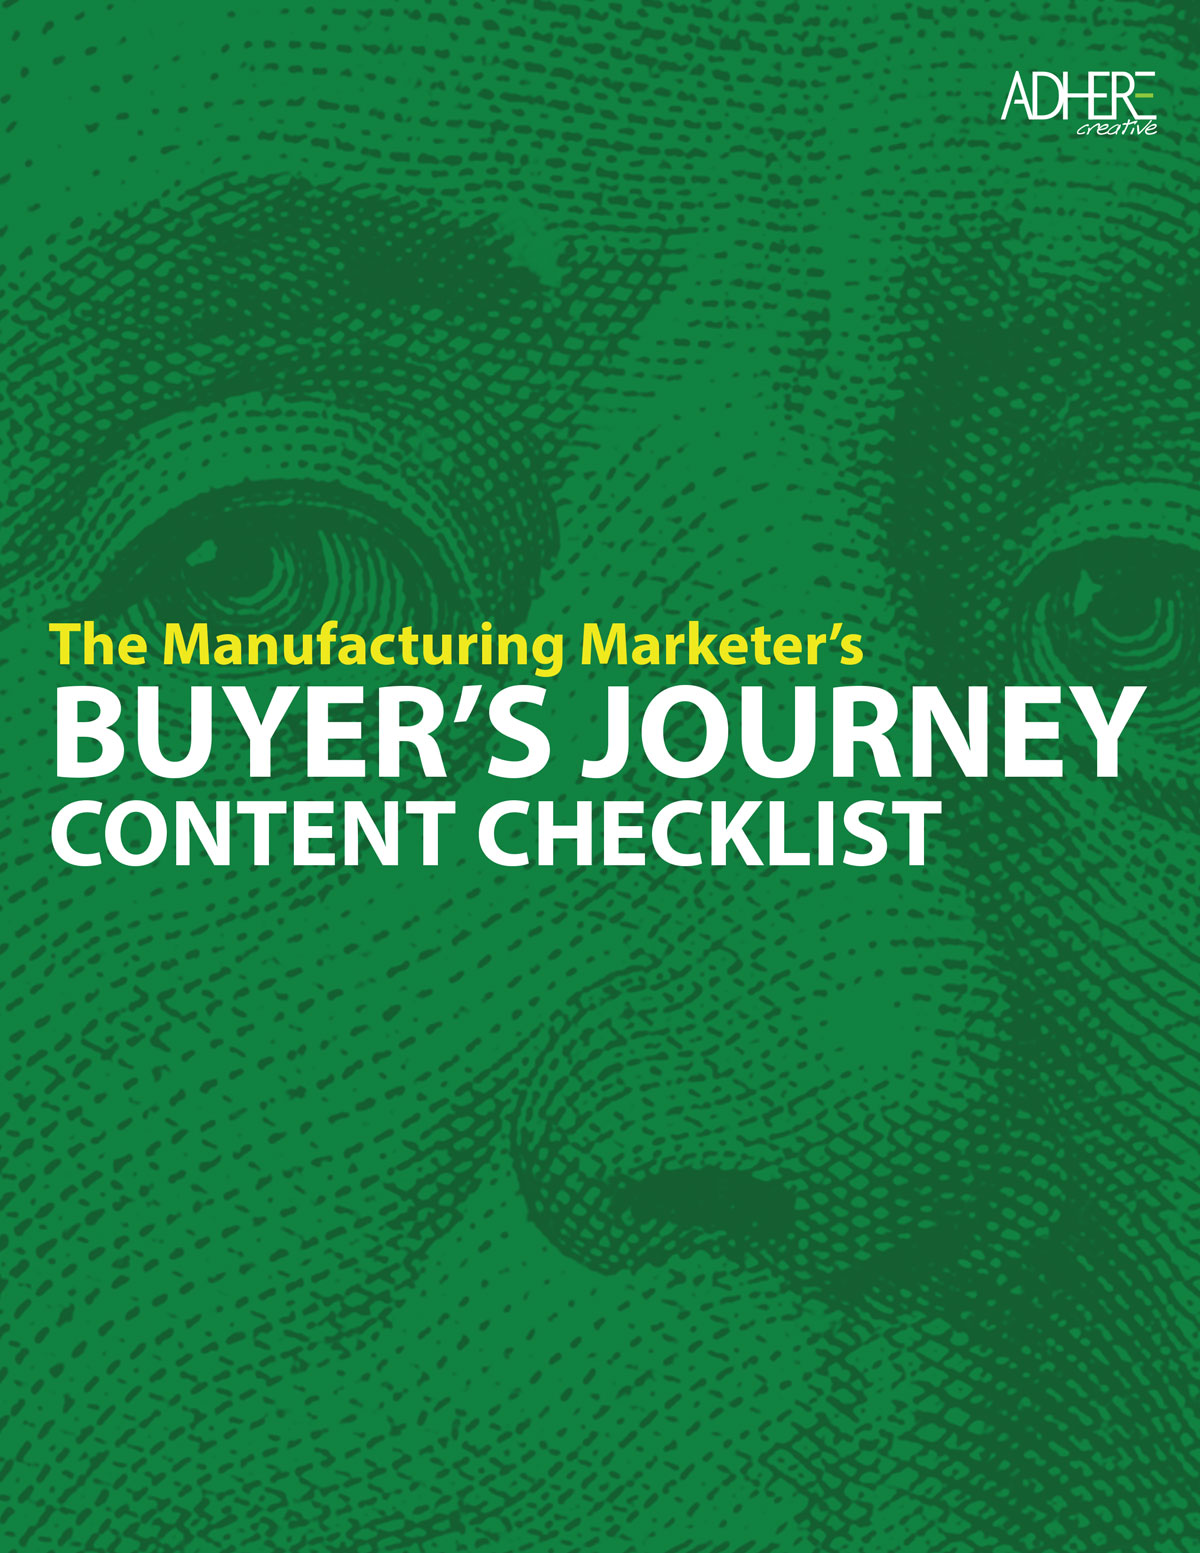 Manufacturing Marketer's Buyer's Journey